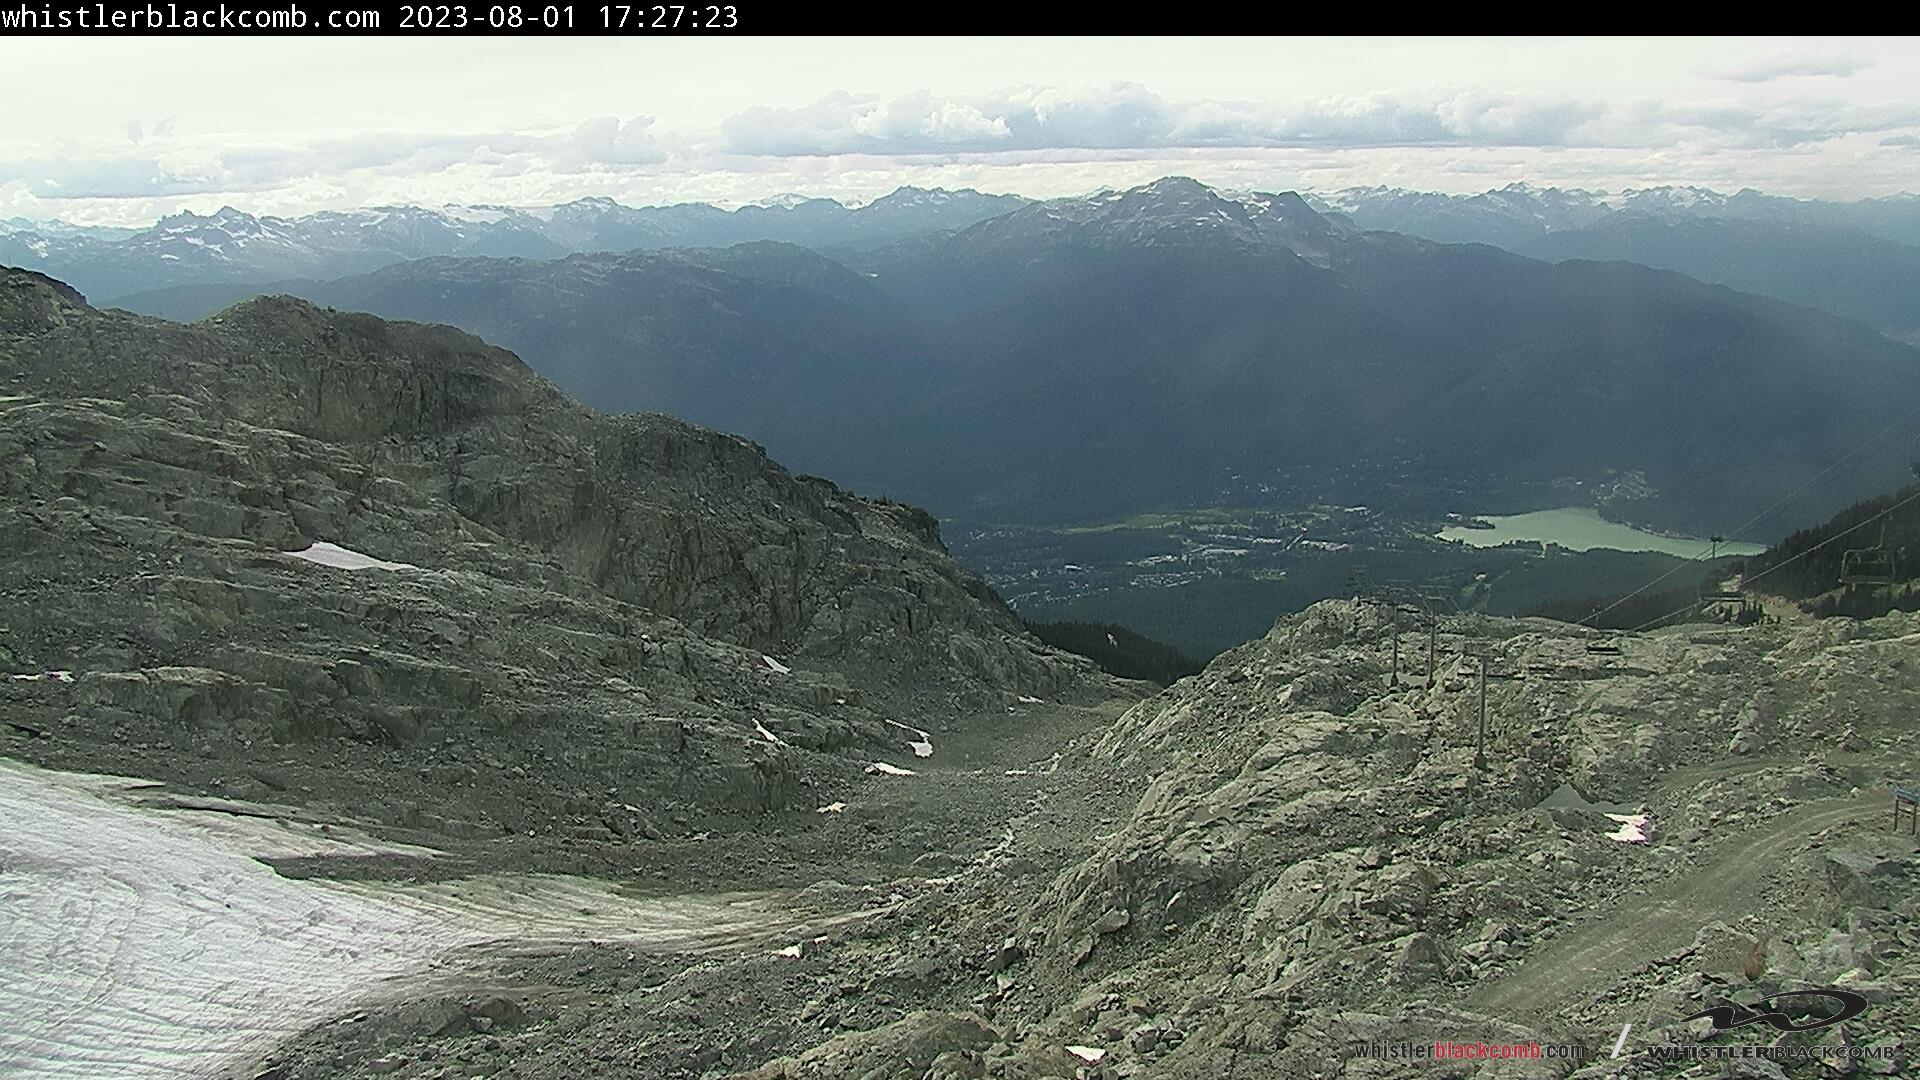 Whistler Blackcomb, Horstman Glacier - Bottom